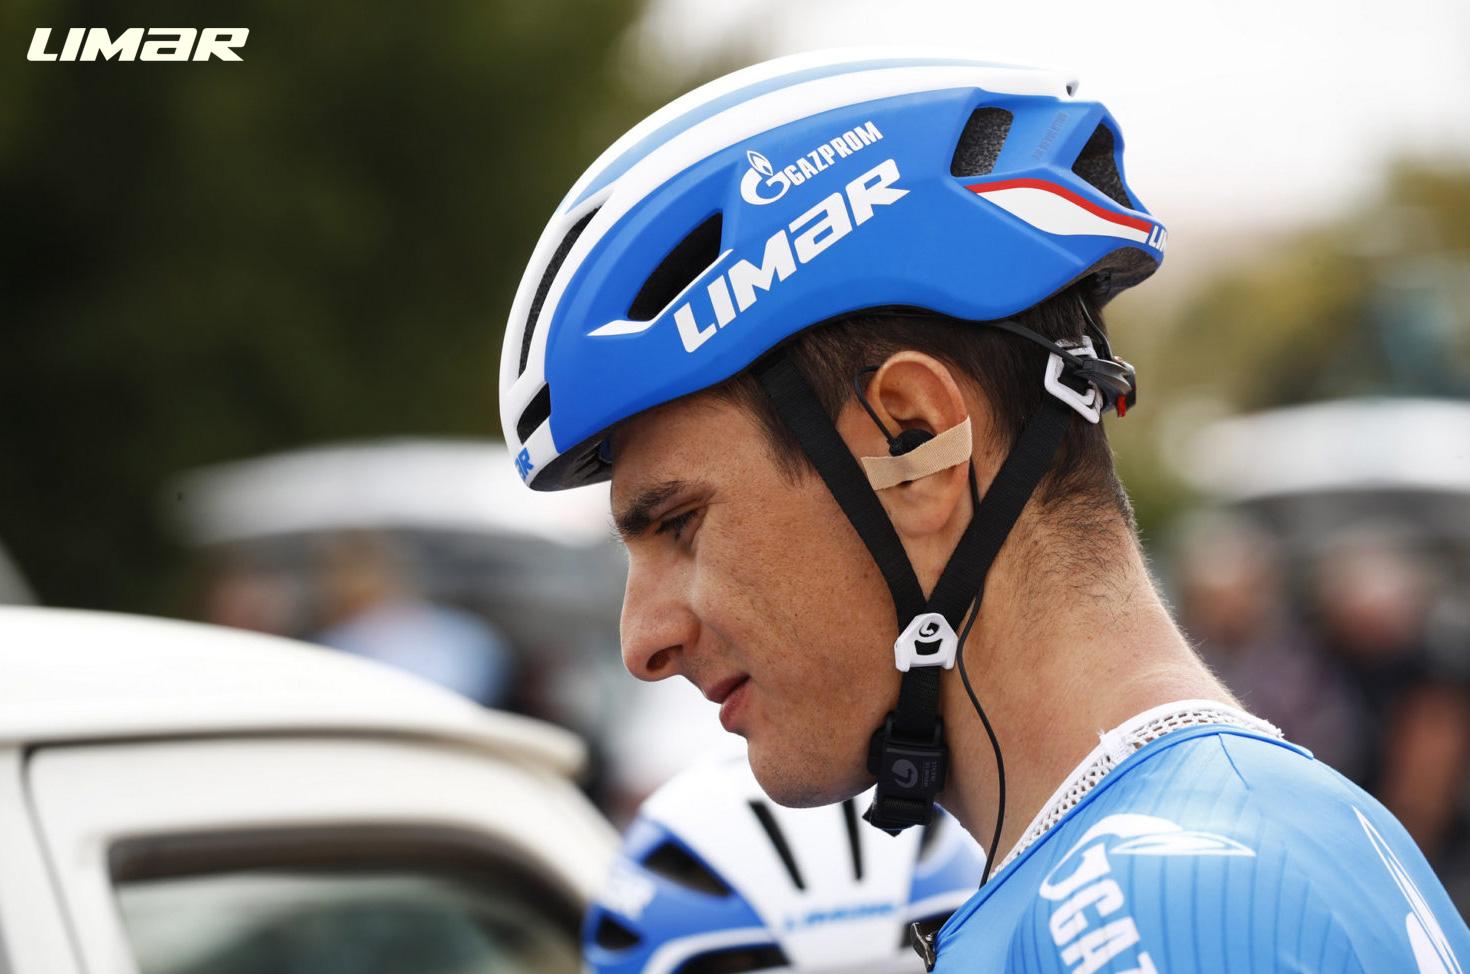 Ciclista indossa il casco Limar Air Speed 2021